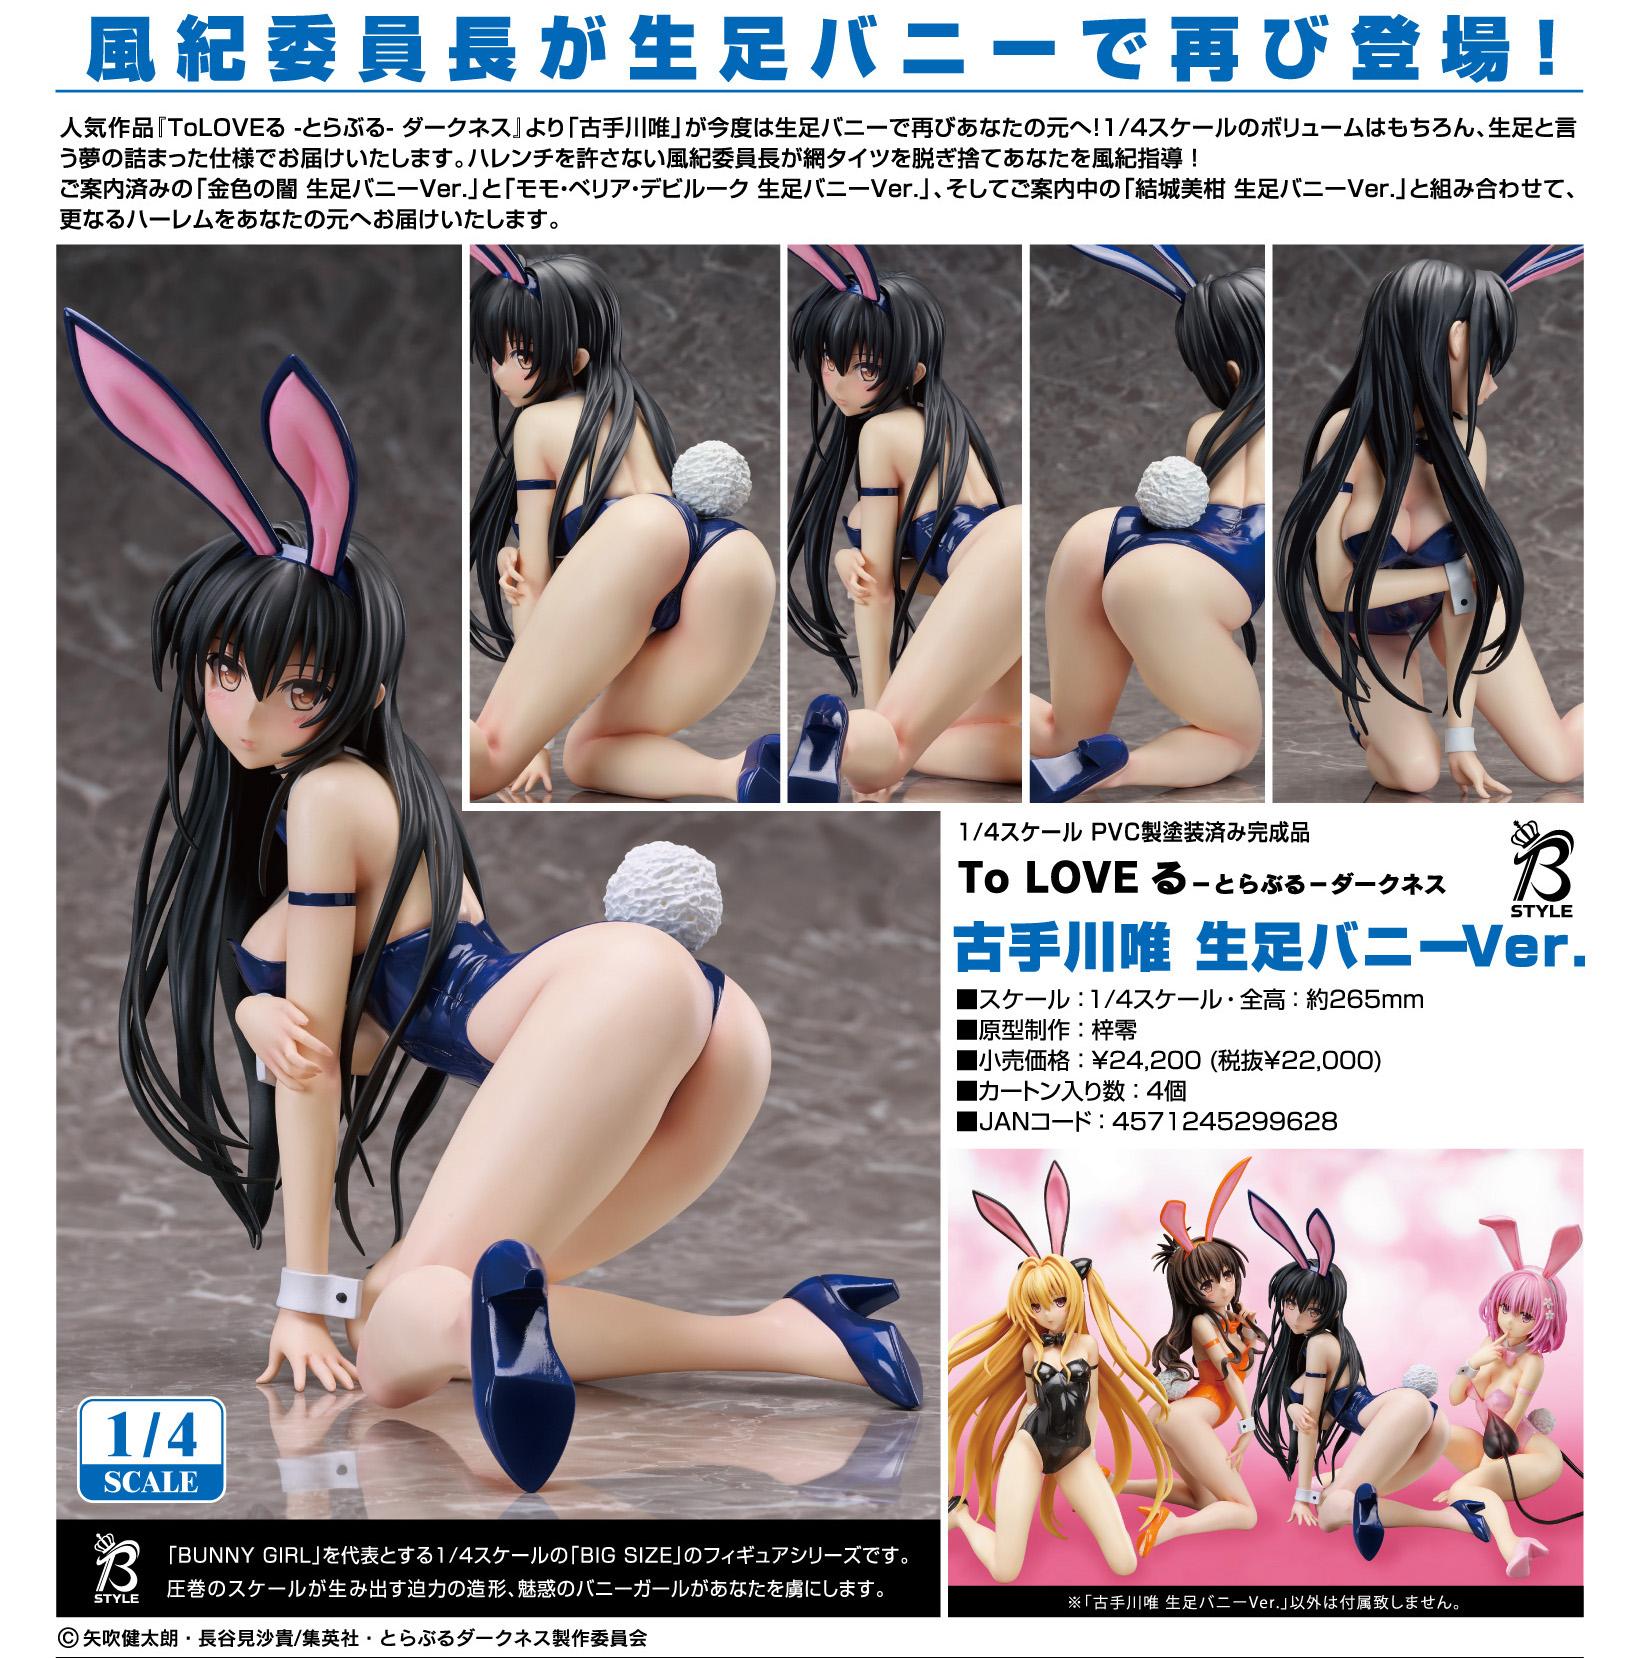 出包王女 Darkness B-STYLE 1/4「古手川唯」裸足兔女郎 Ver. B-STYLE 1/4 Kotegawa Yui Bare Legs Bunny Ver.【To Love-Ru Darkness】